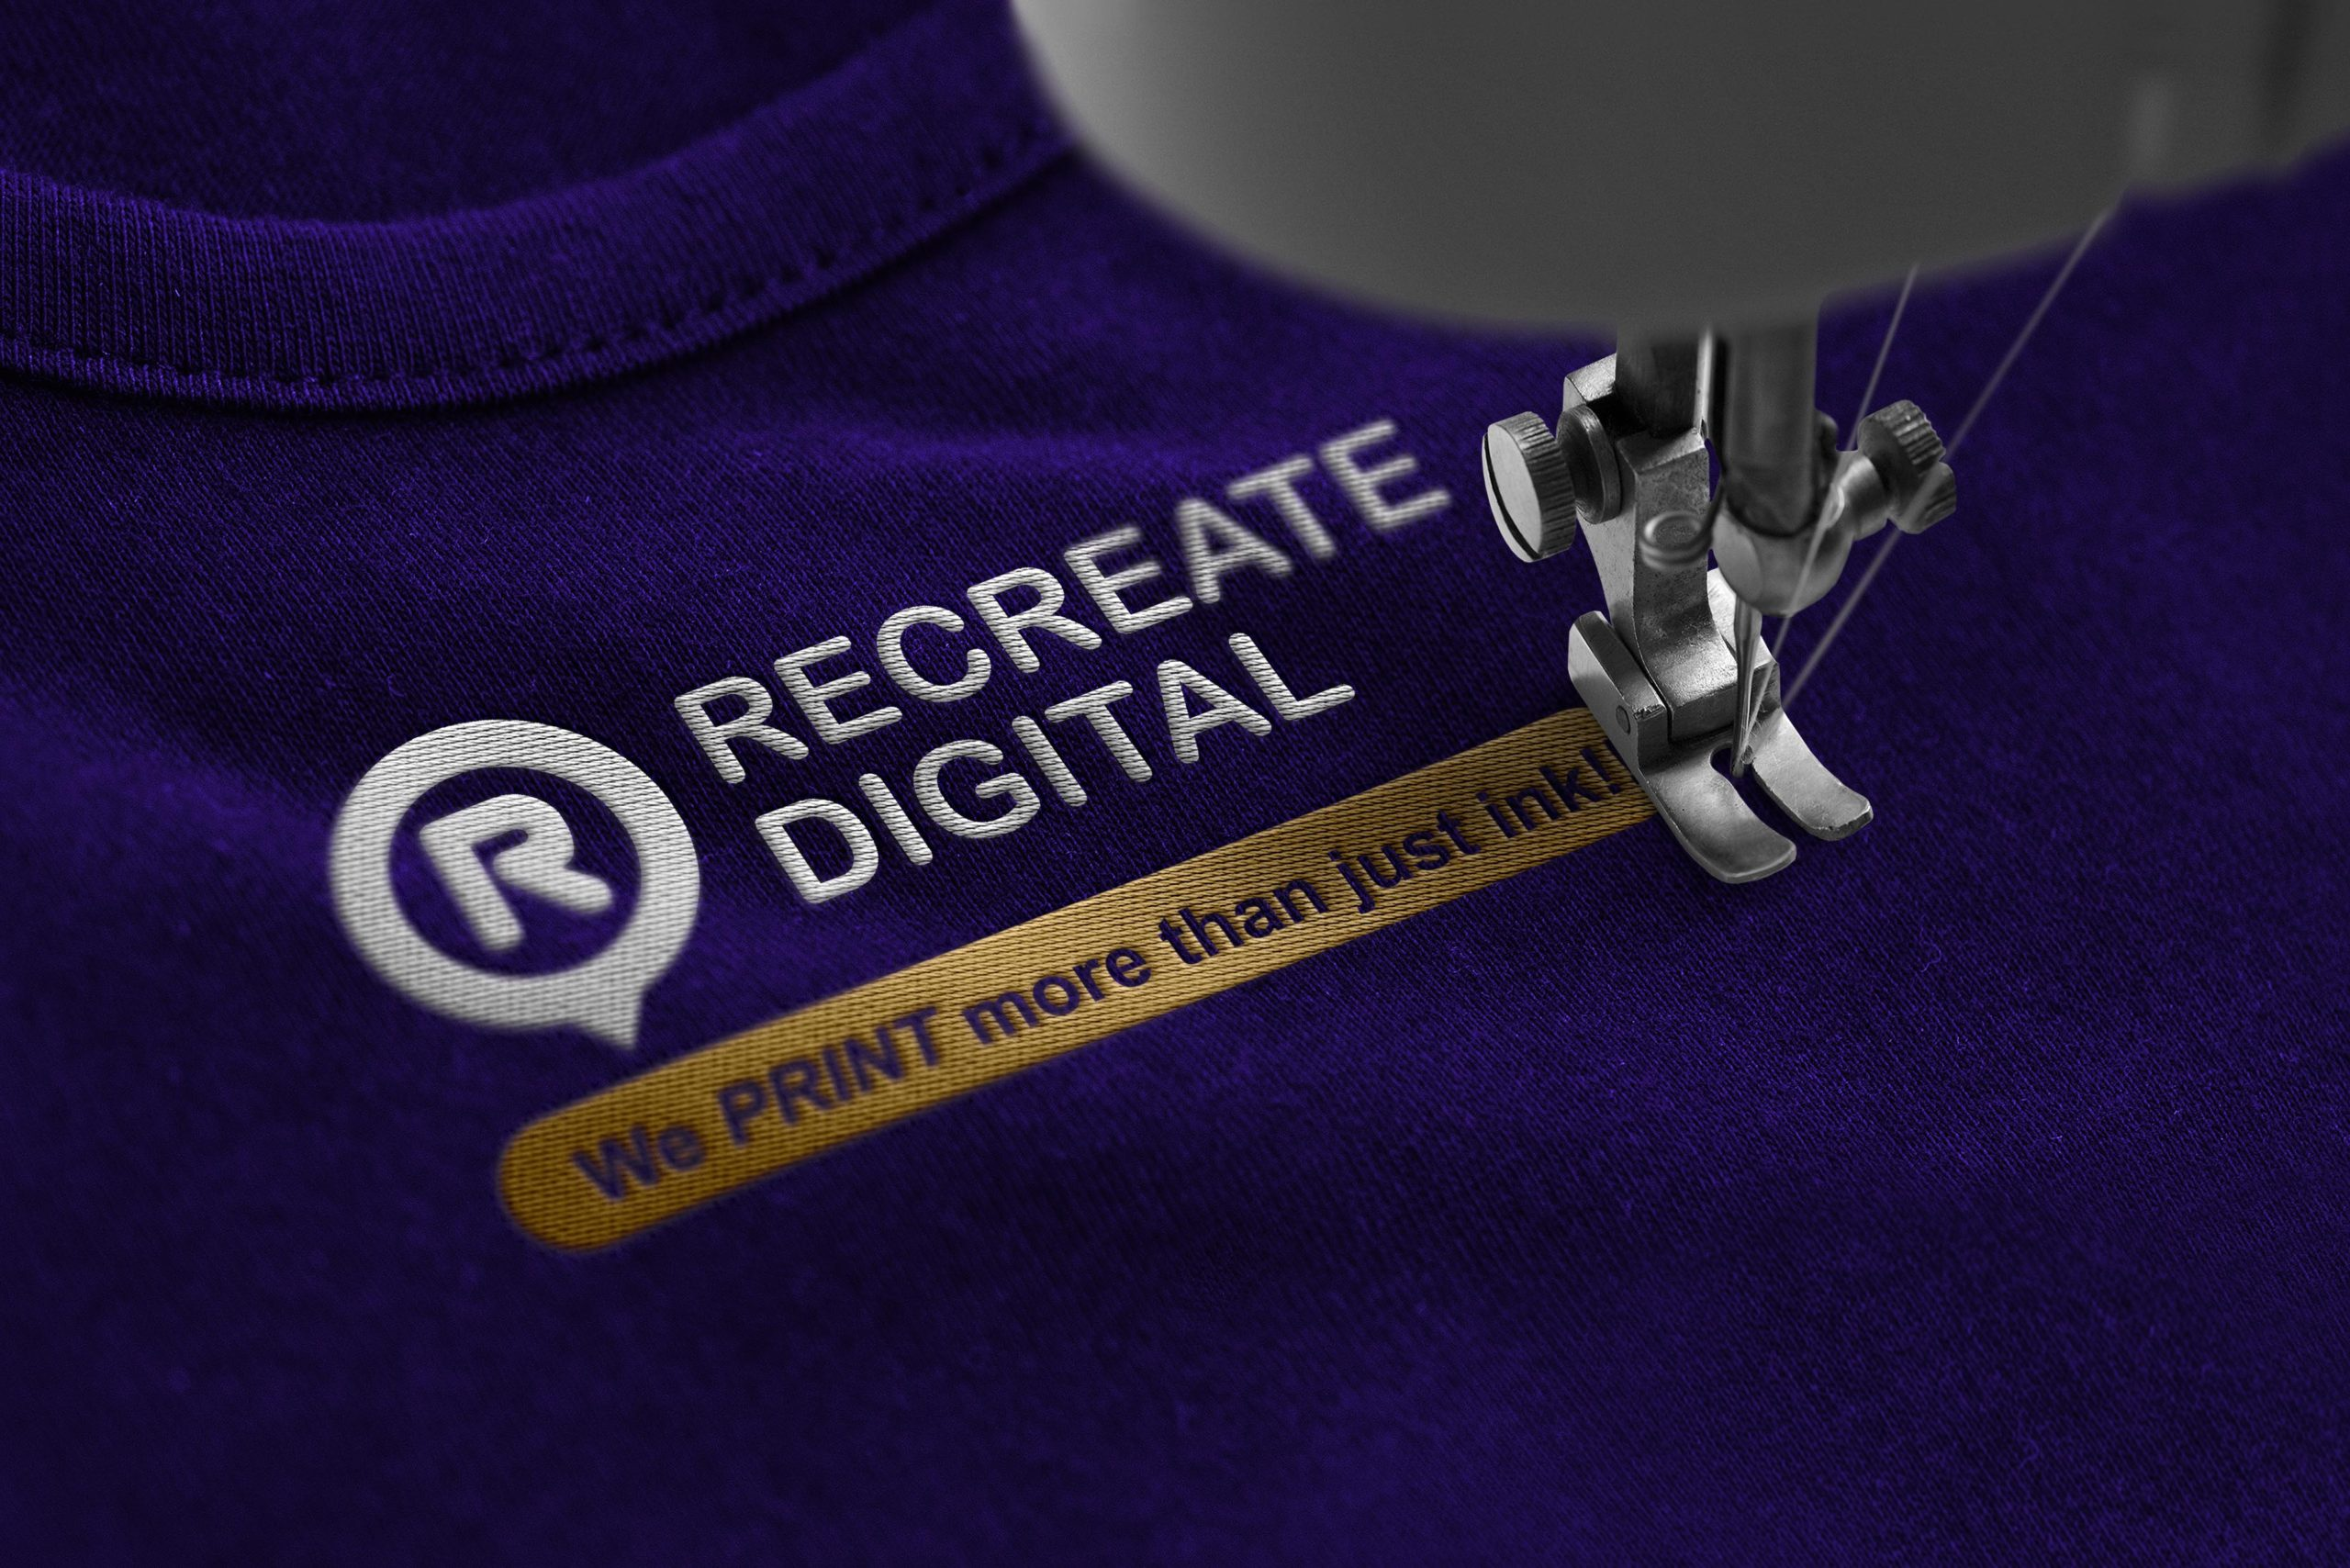 Recreate Digital